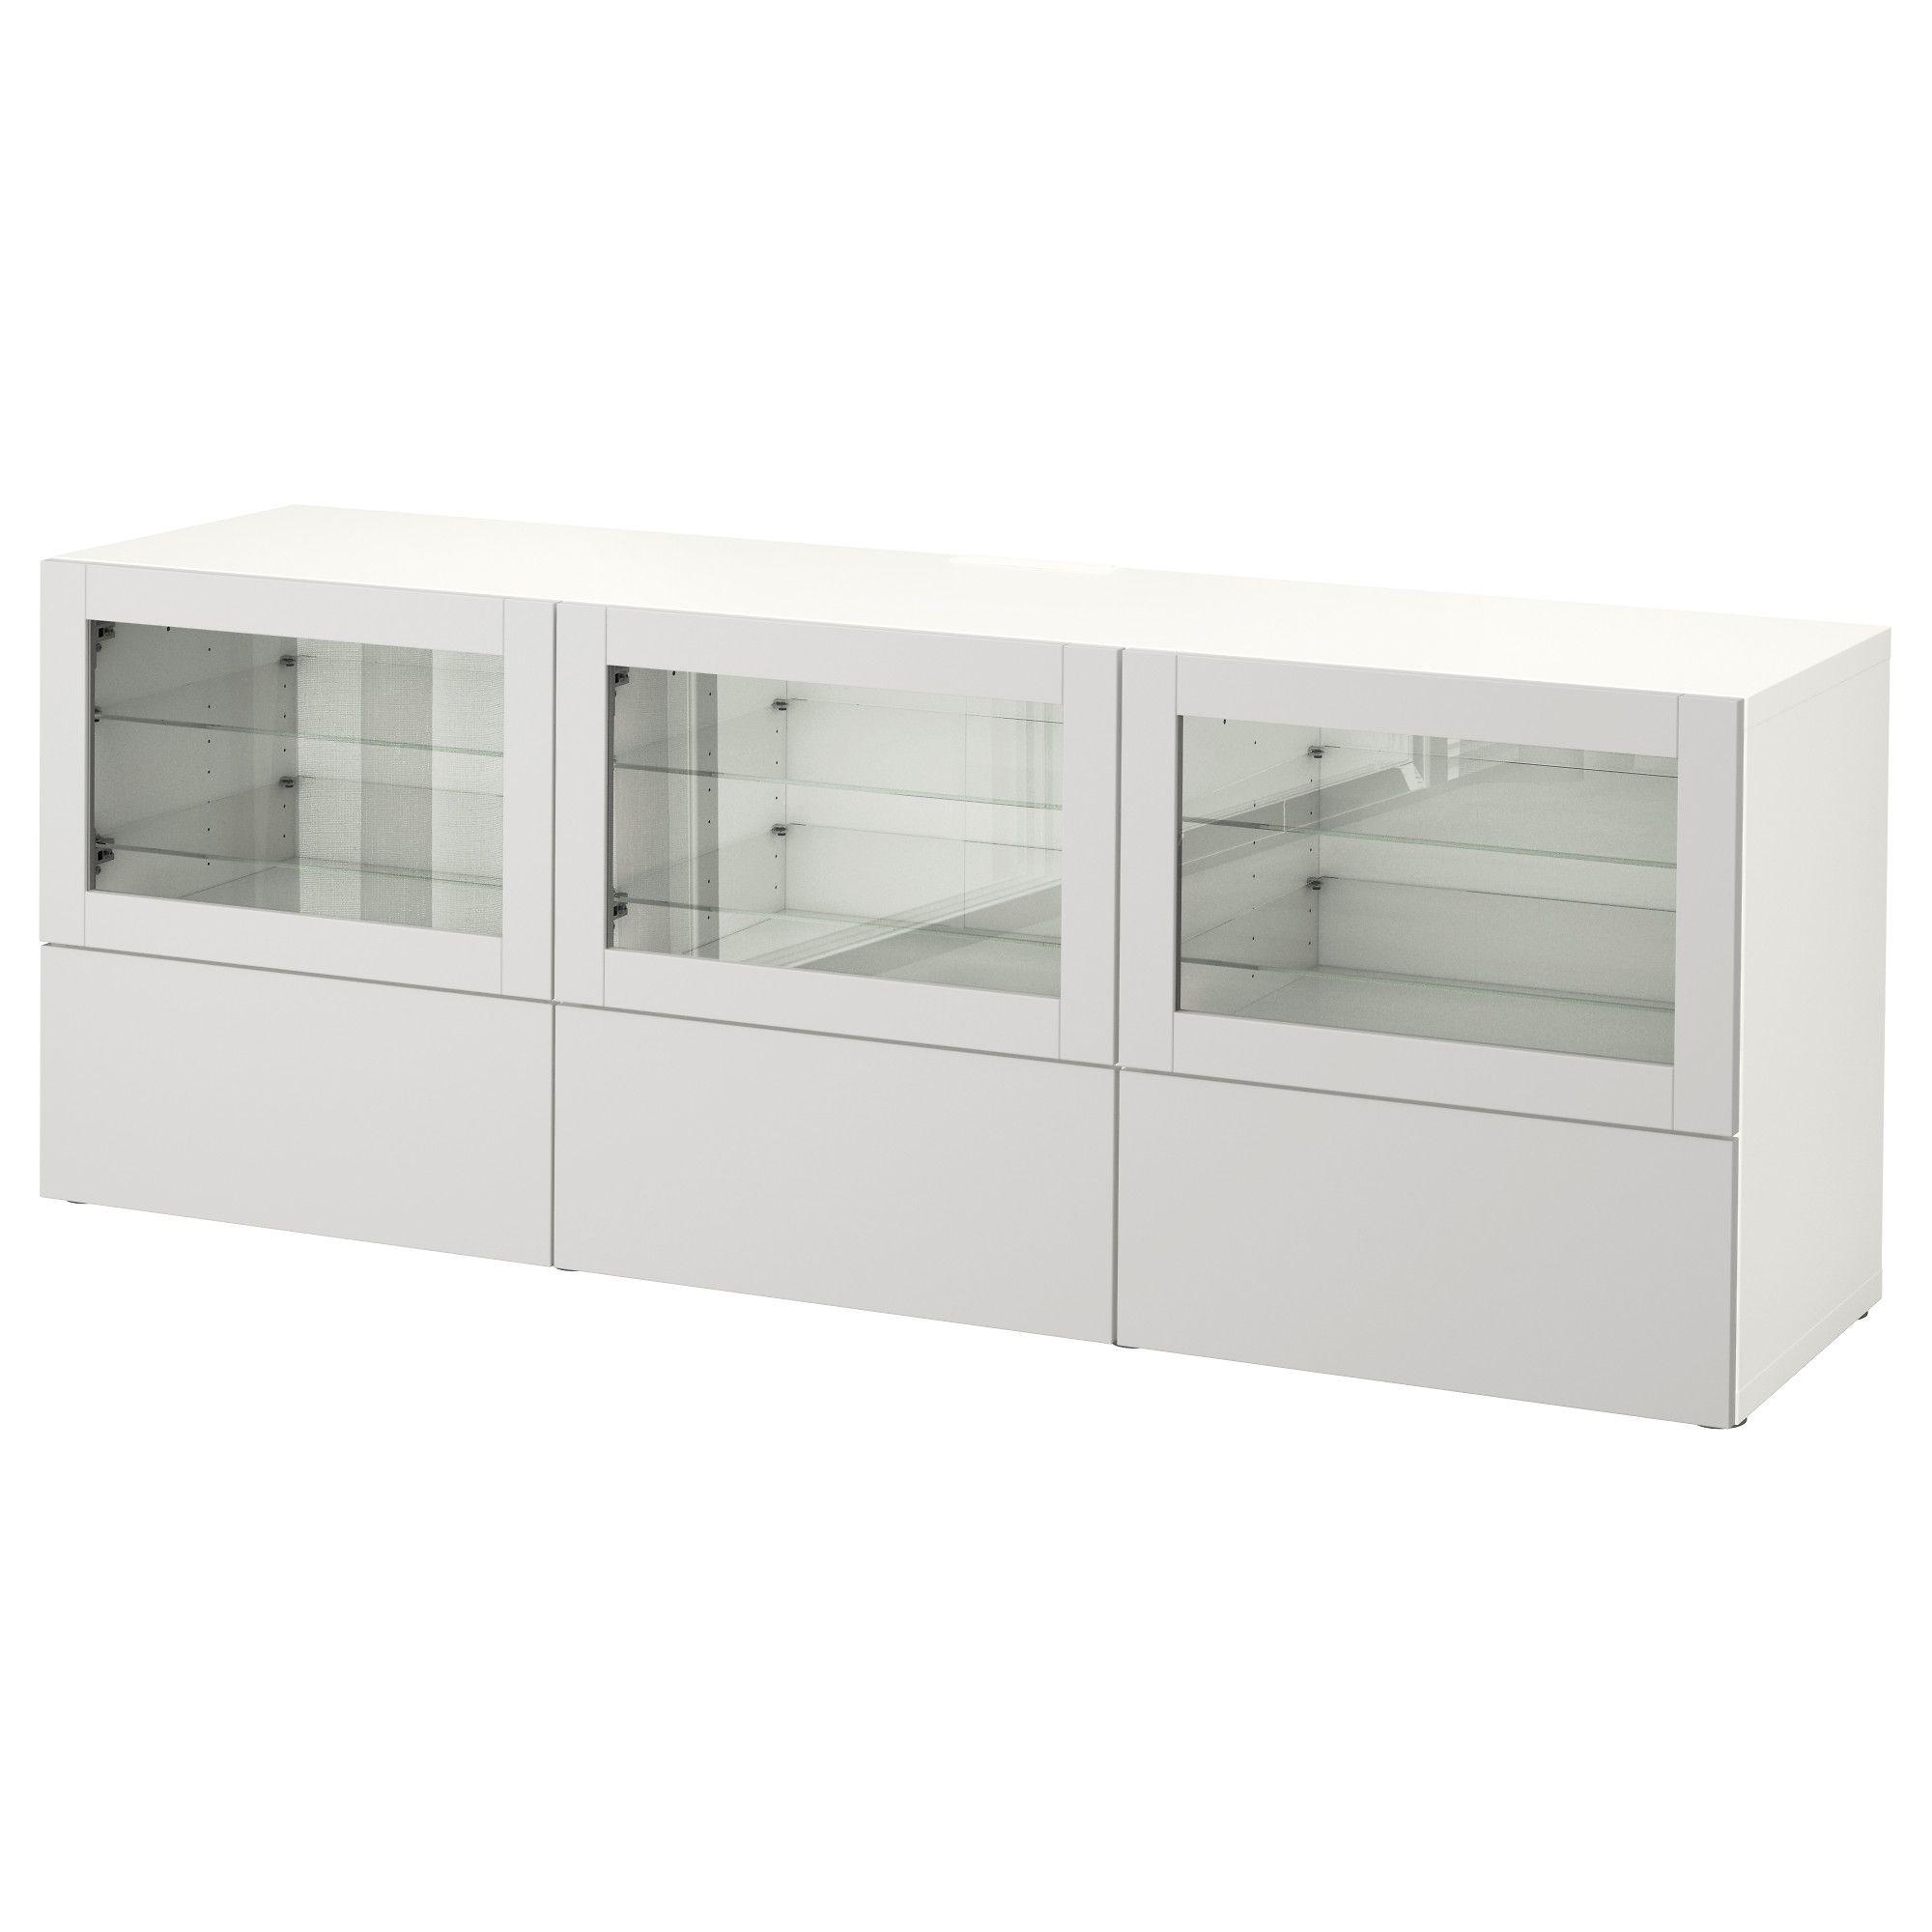 Bestå Tv Unit With Doors And Drawers White Lappviken Light Gray